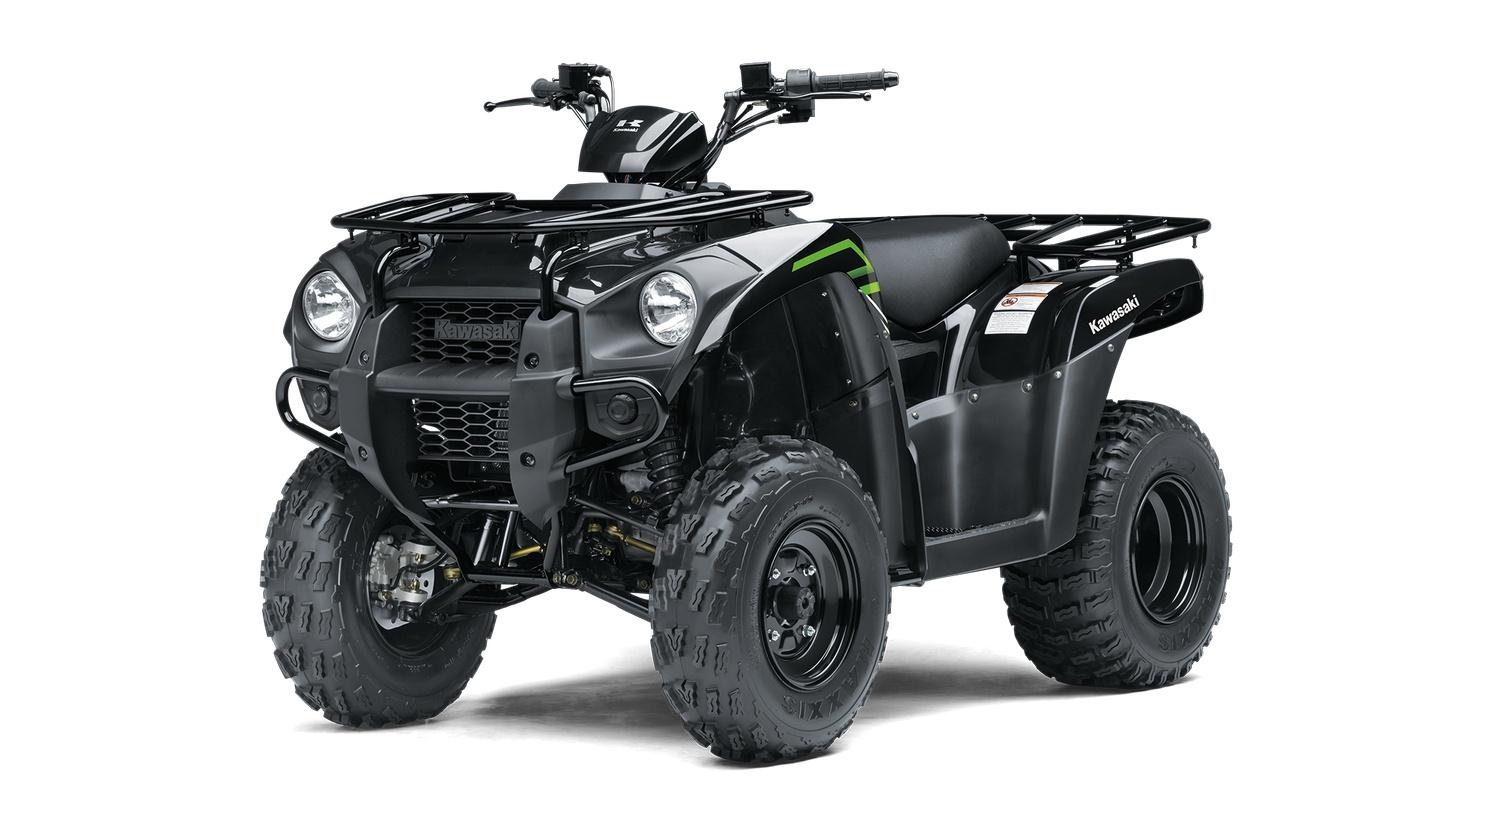 2020 Kawasaki BRUTE FORCE 300 Super Black